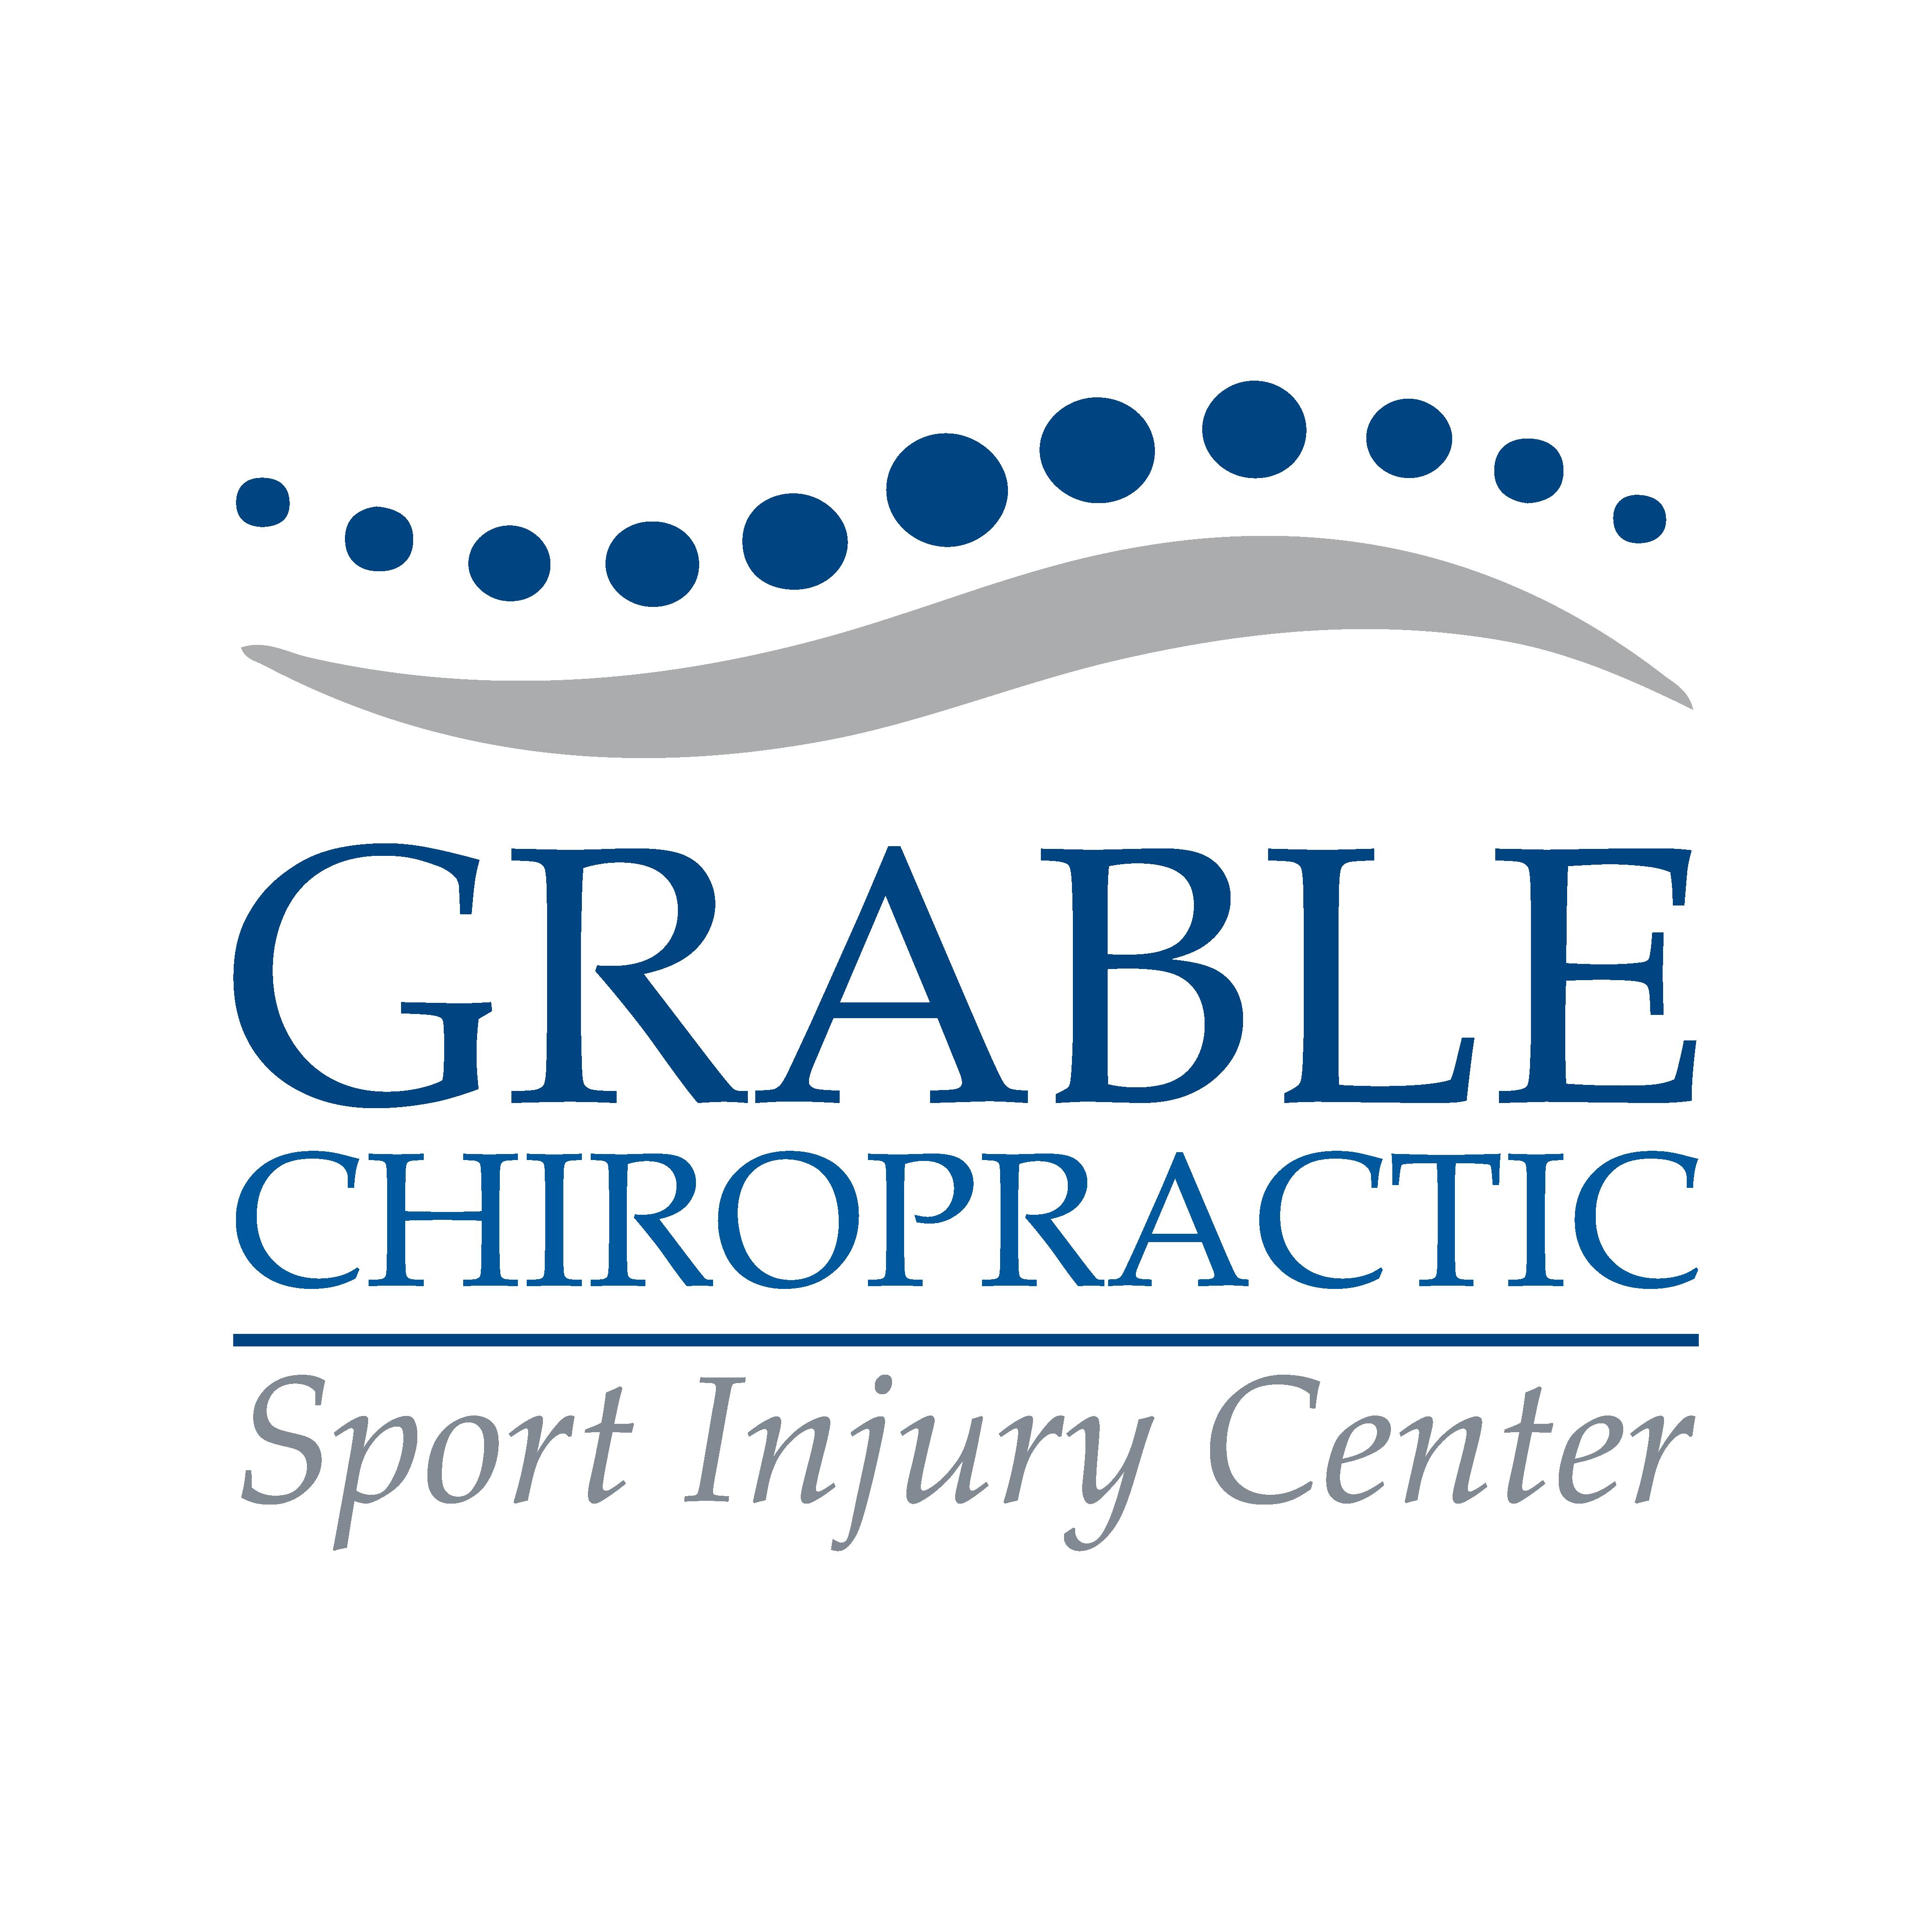 Grable Chiropractic Sport Injury Center Logo